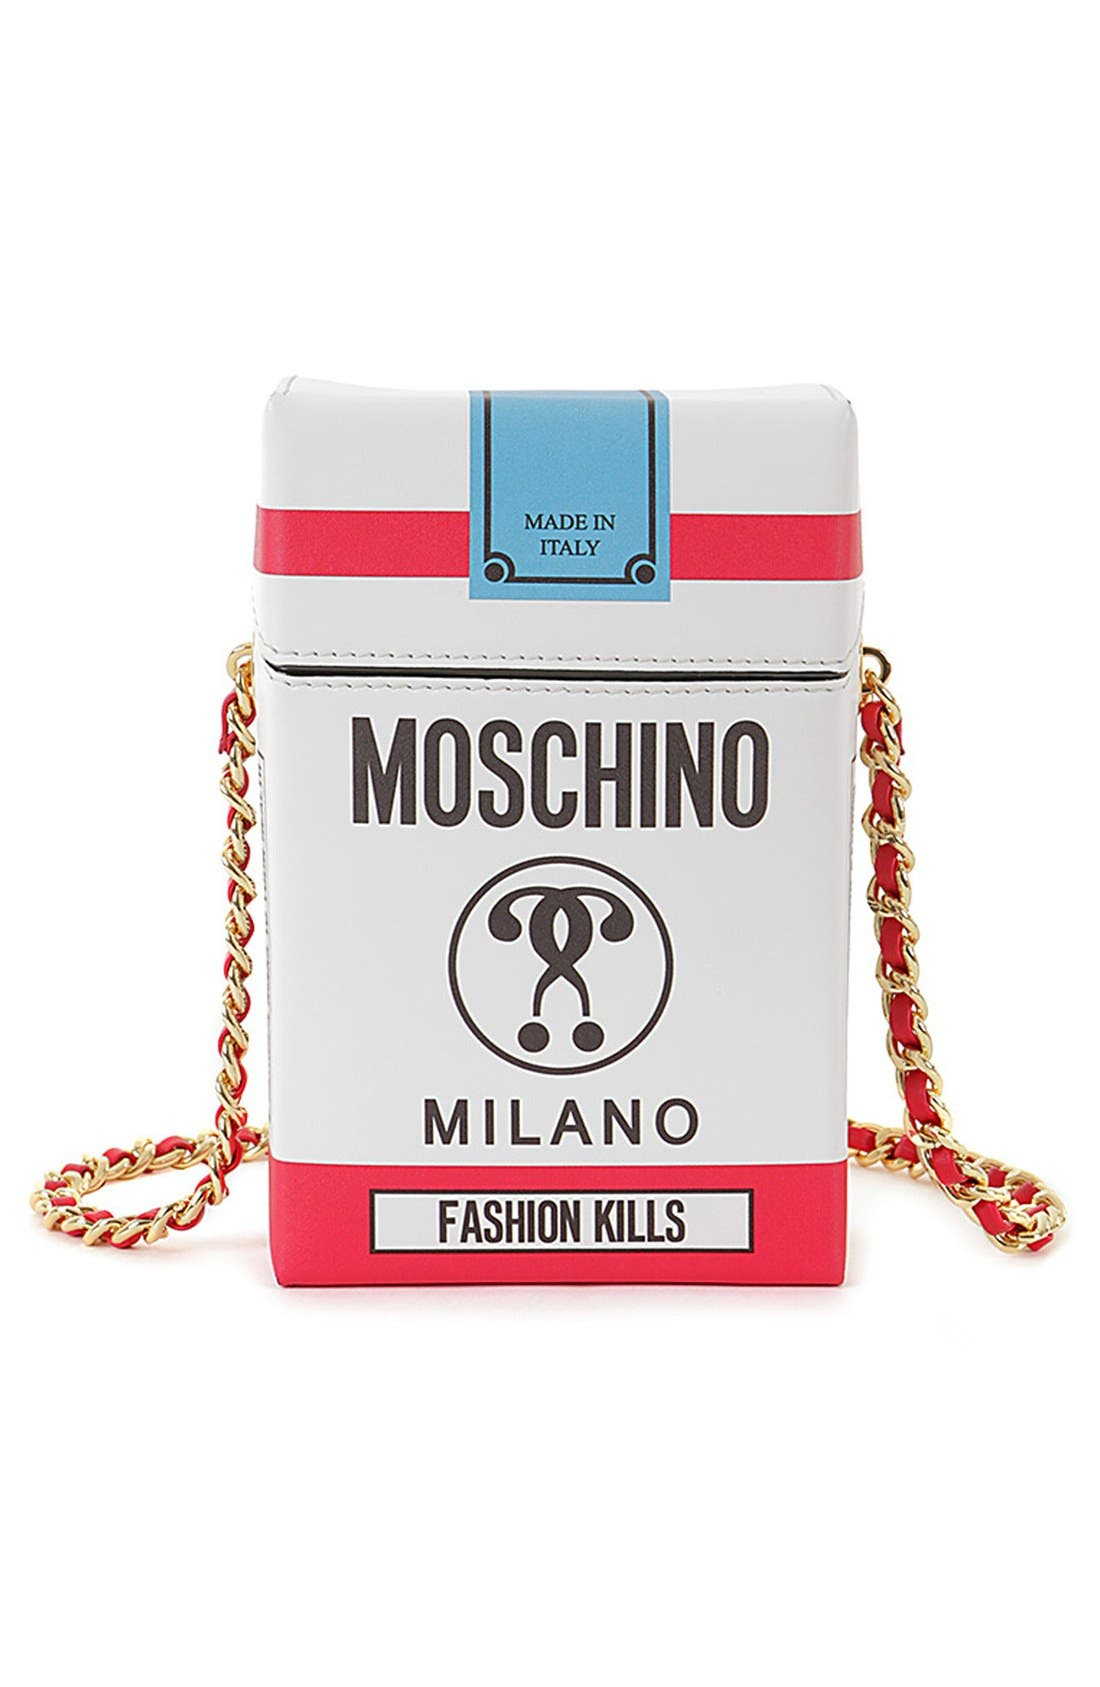 Main Image - Moschino 'Fashion Kills' Crossbody Bag